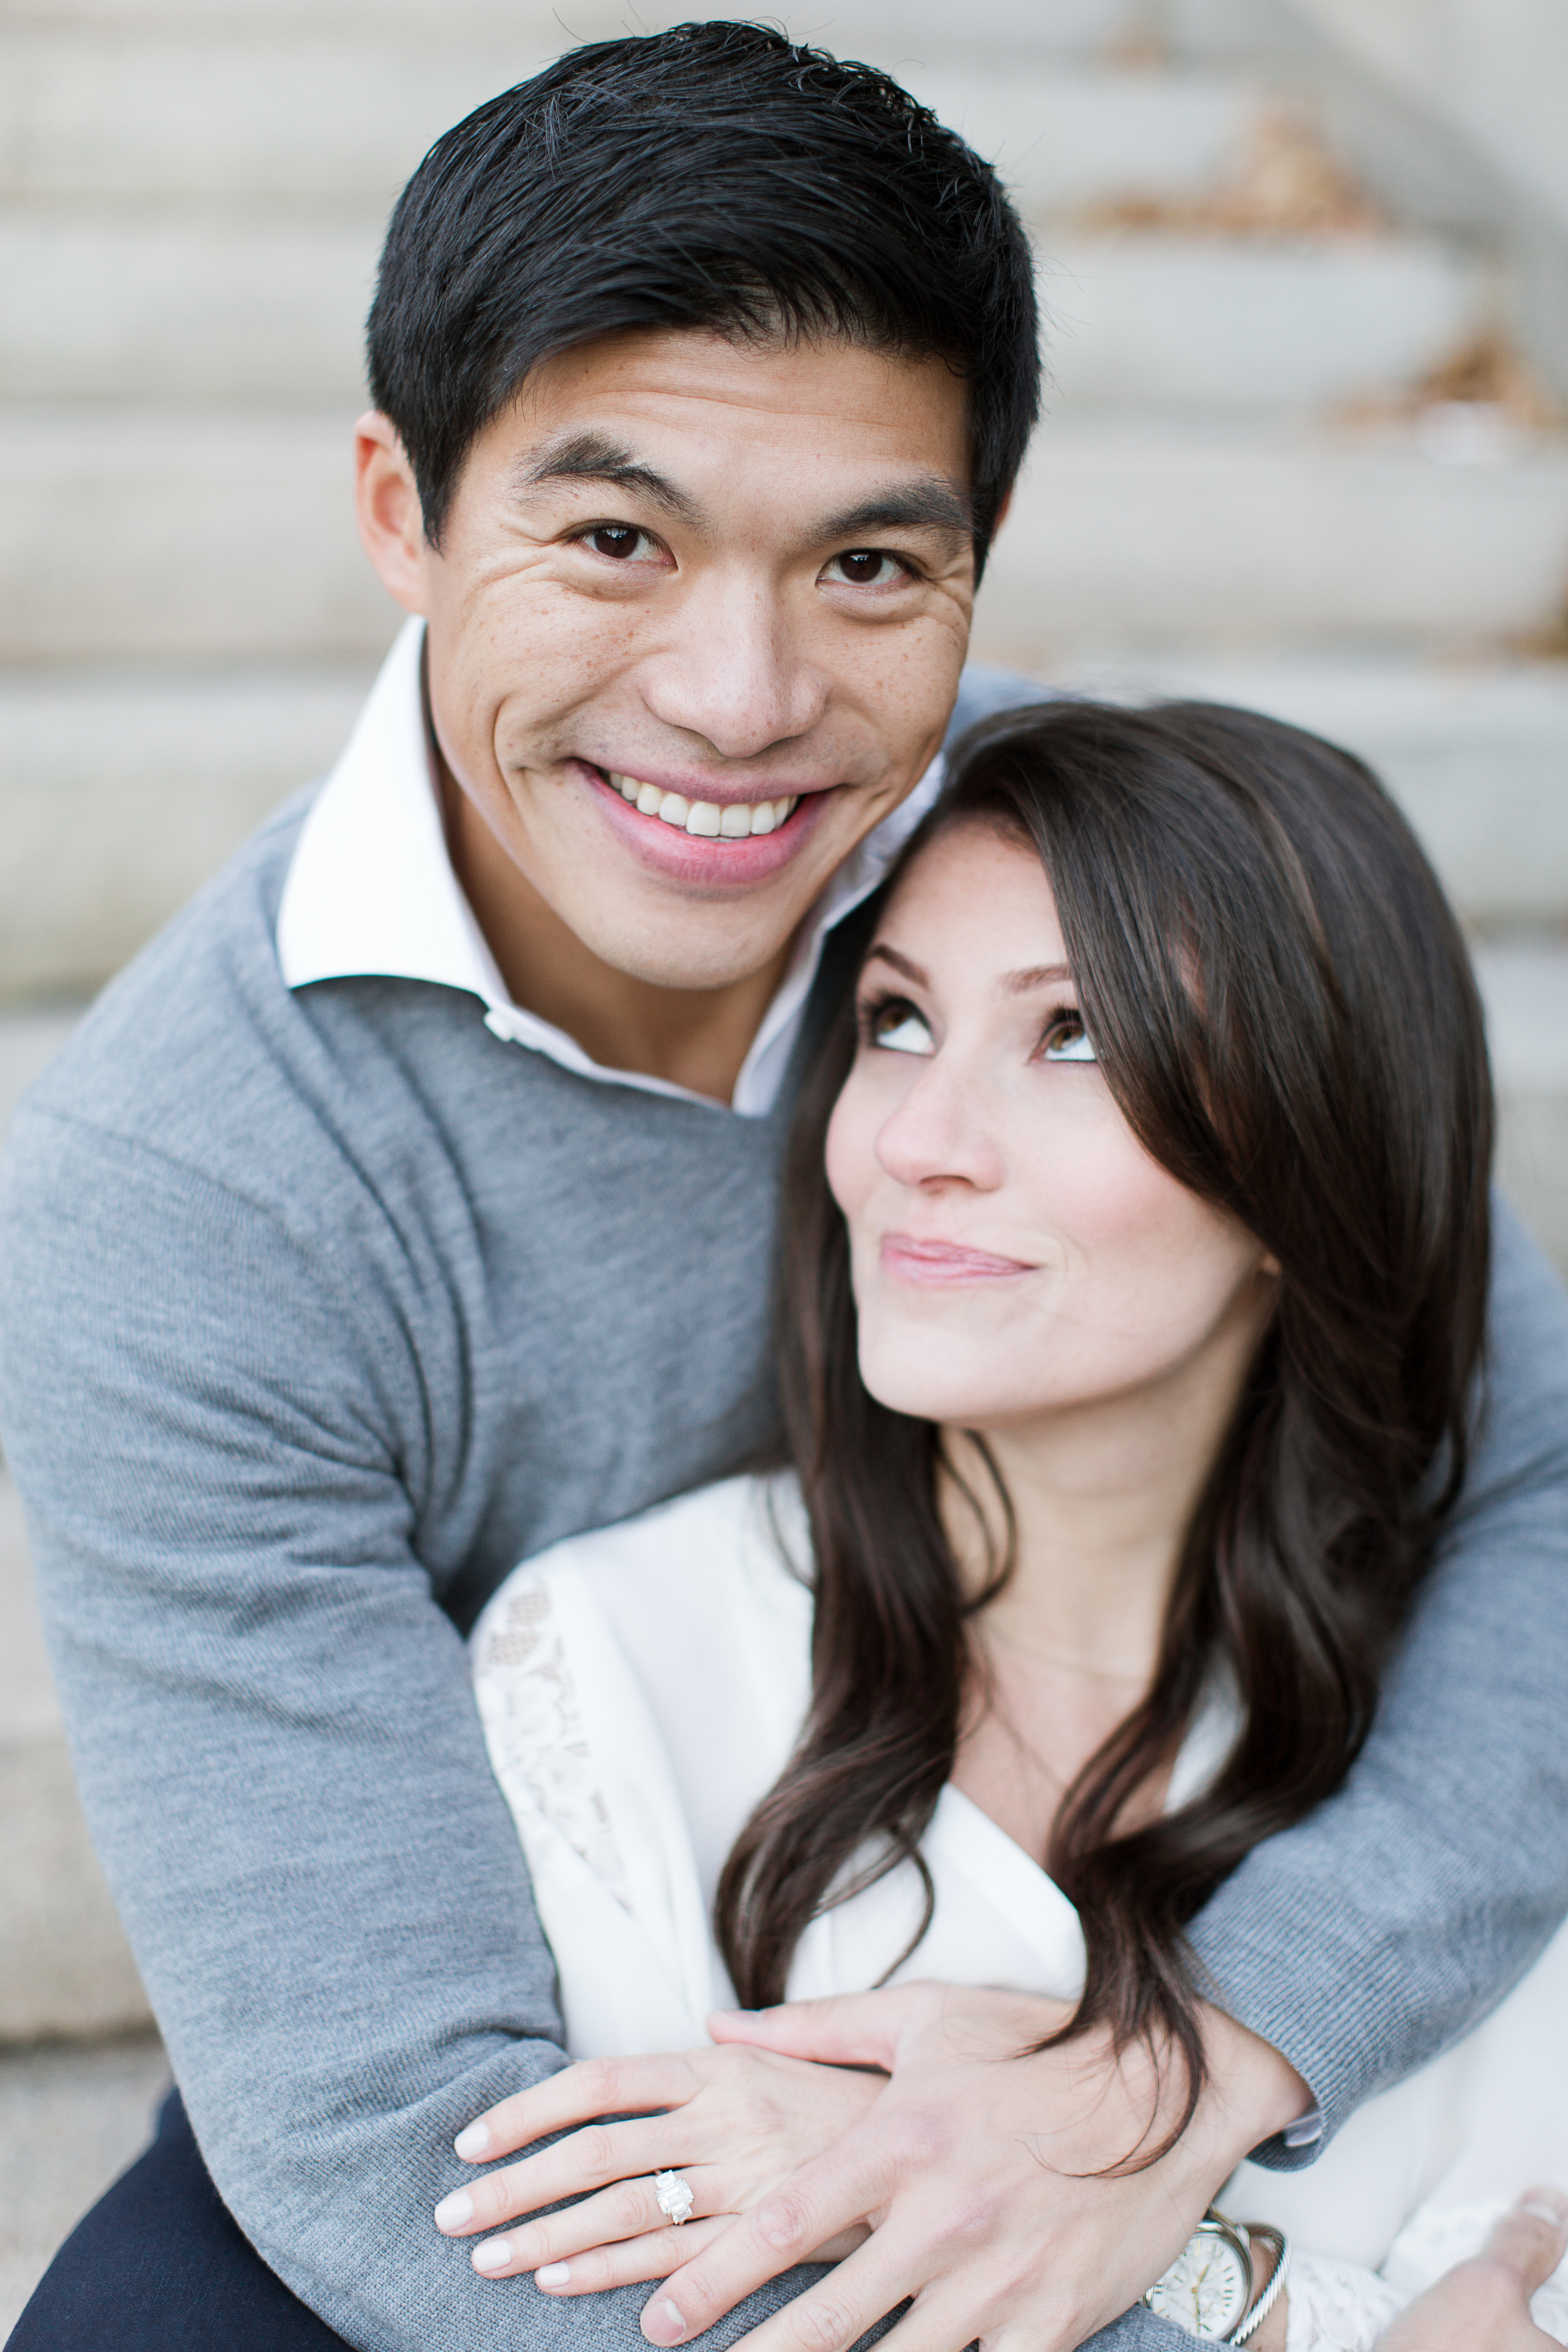 Melissa Kruse Photography - Emily + Kevin Engagement Session-203.jpg